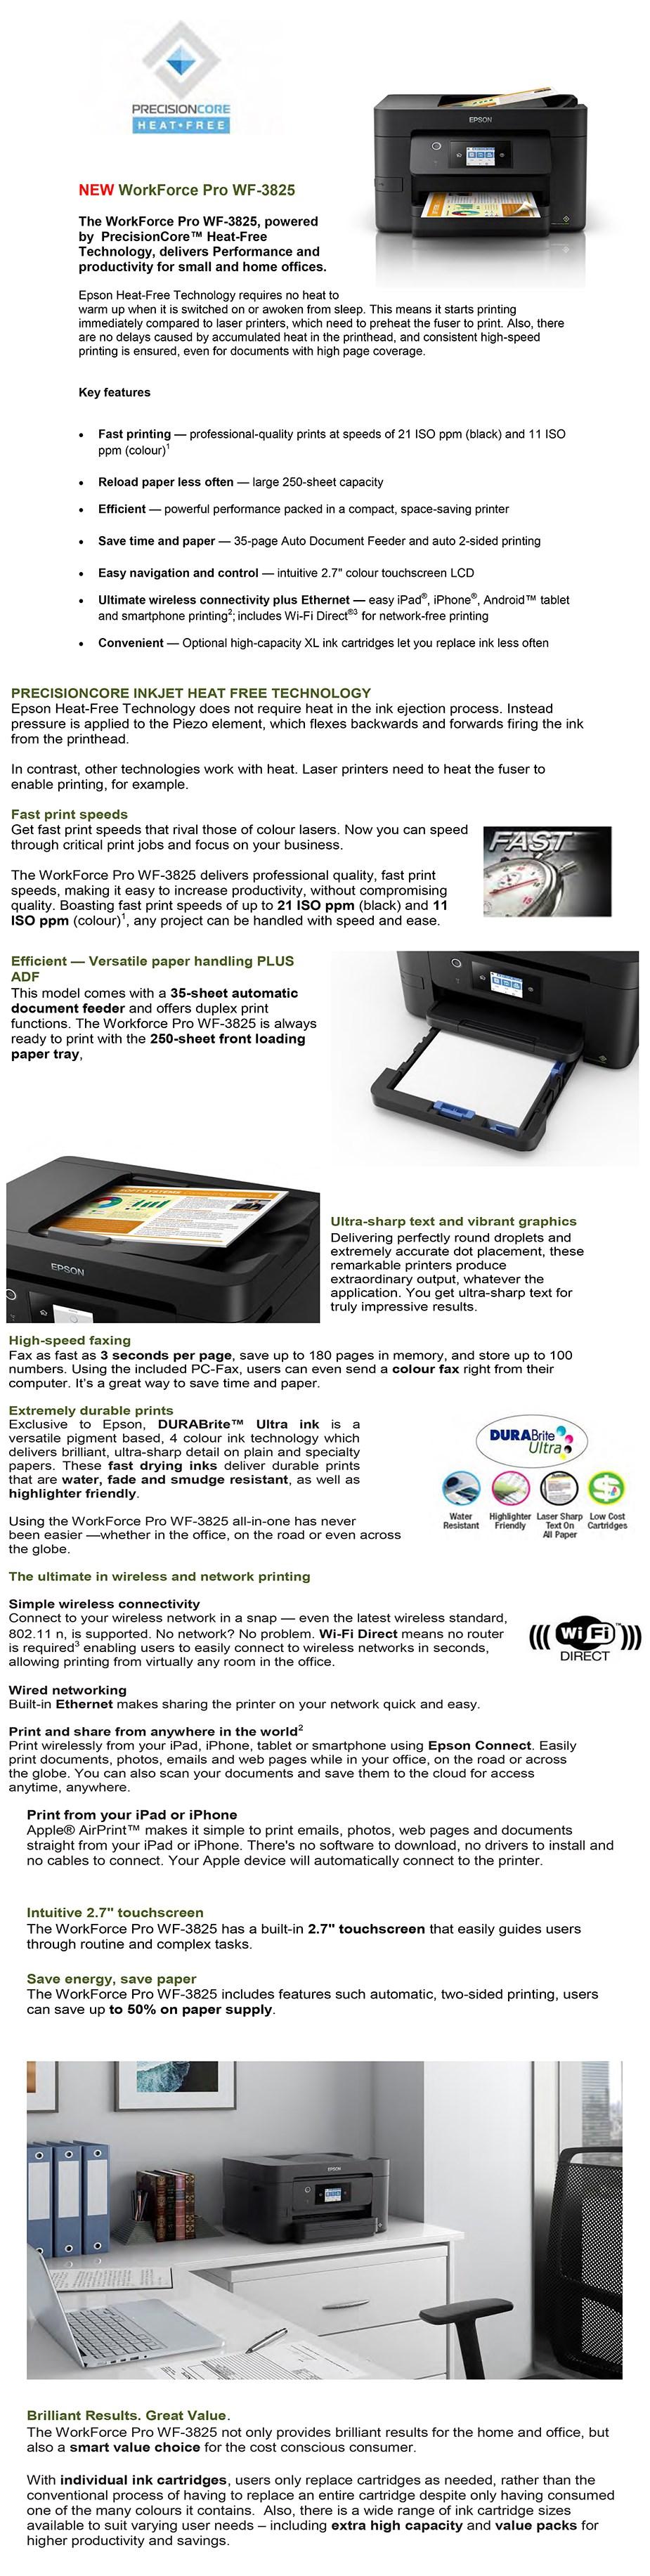 Epson WorkForce Pro WF-3825 A4 Wireless Colour Multifunction Inkjet Printer - Overview 1